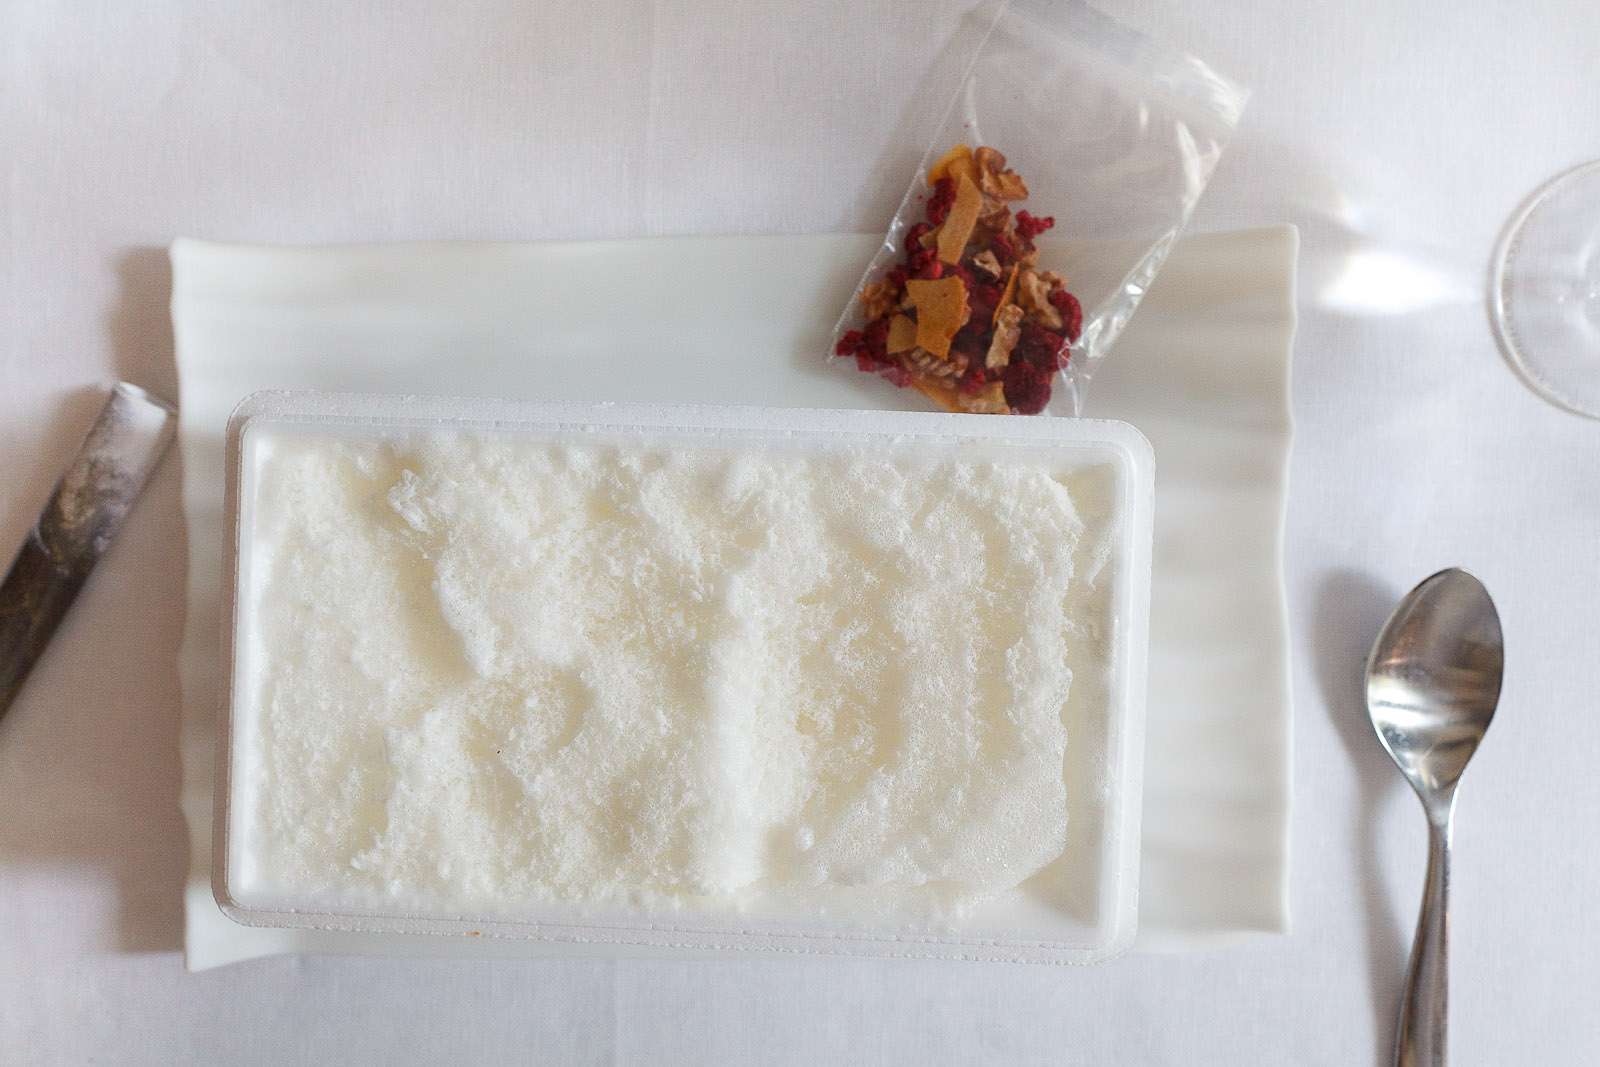 21st Course, Part II: Parmesan frozen-air with museli